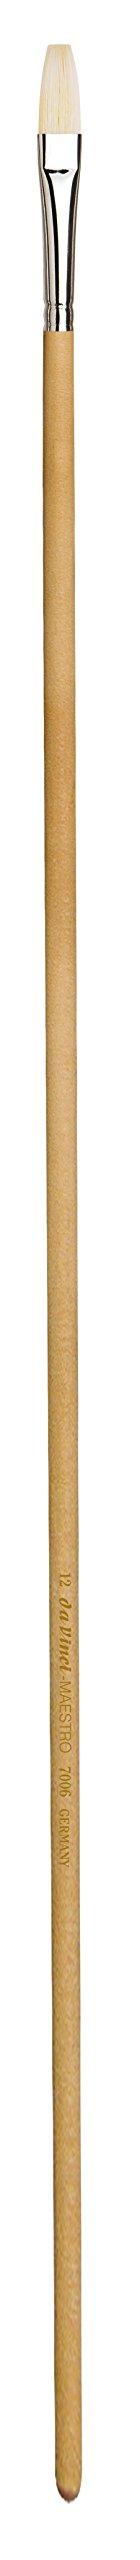 da Vinci Mural Series 7006 Maestro Paint Brush, Flat Hand-Interlocked Hog Bristle with 24-Inch Handle, Size 12